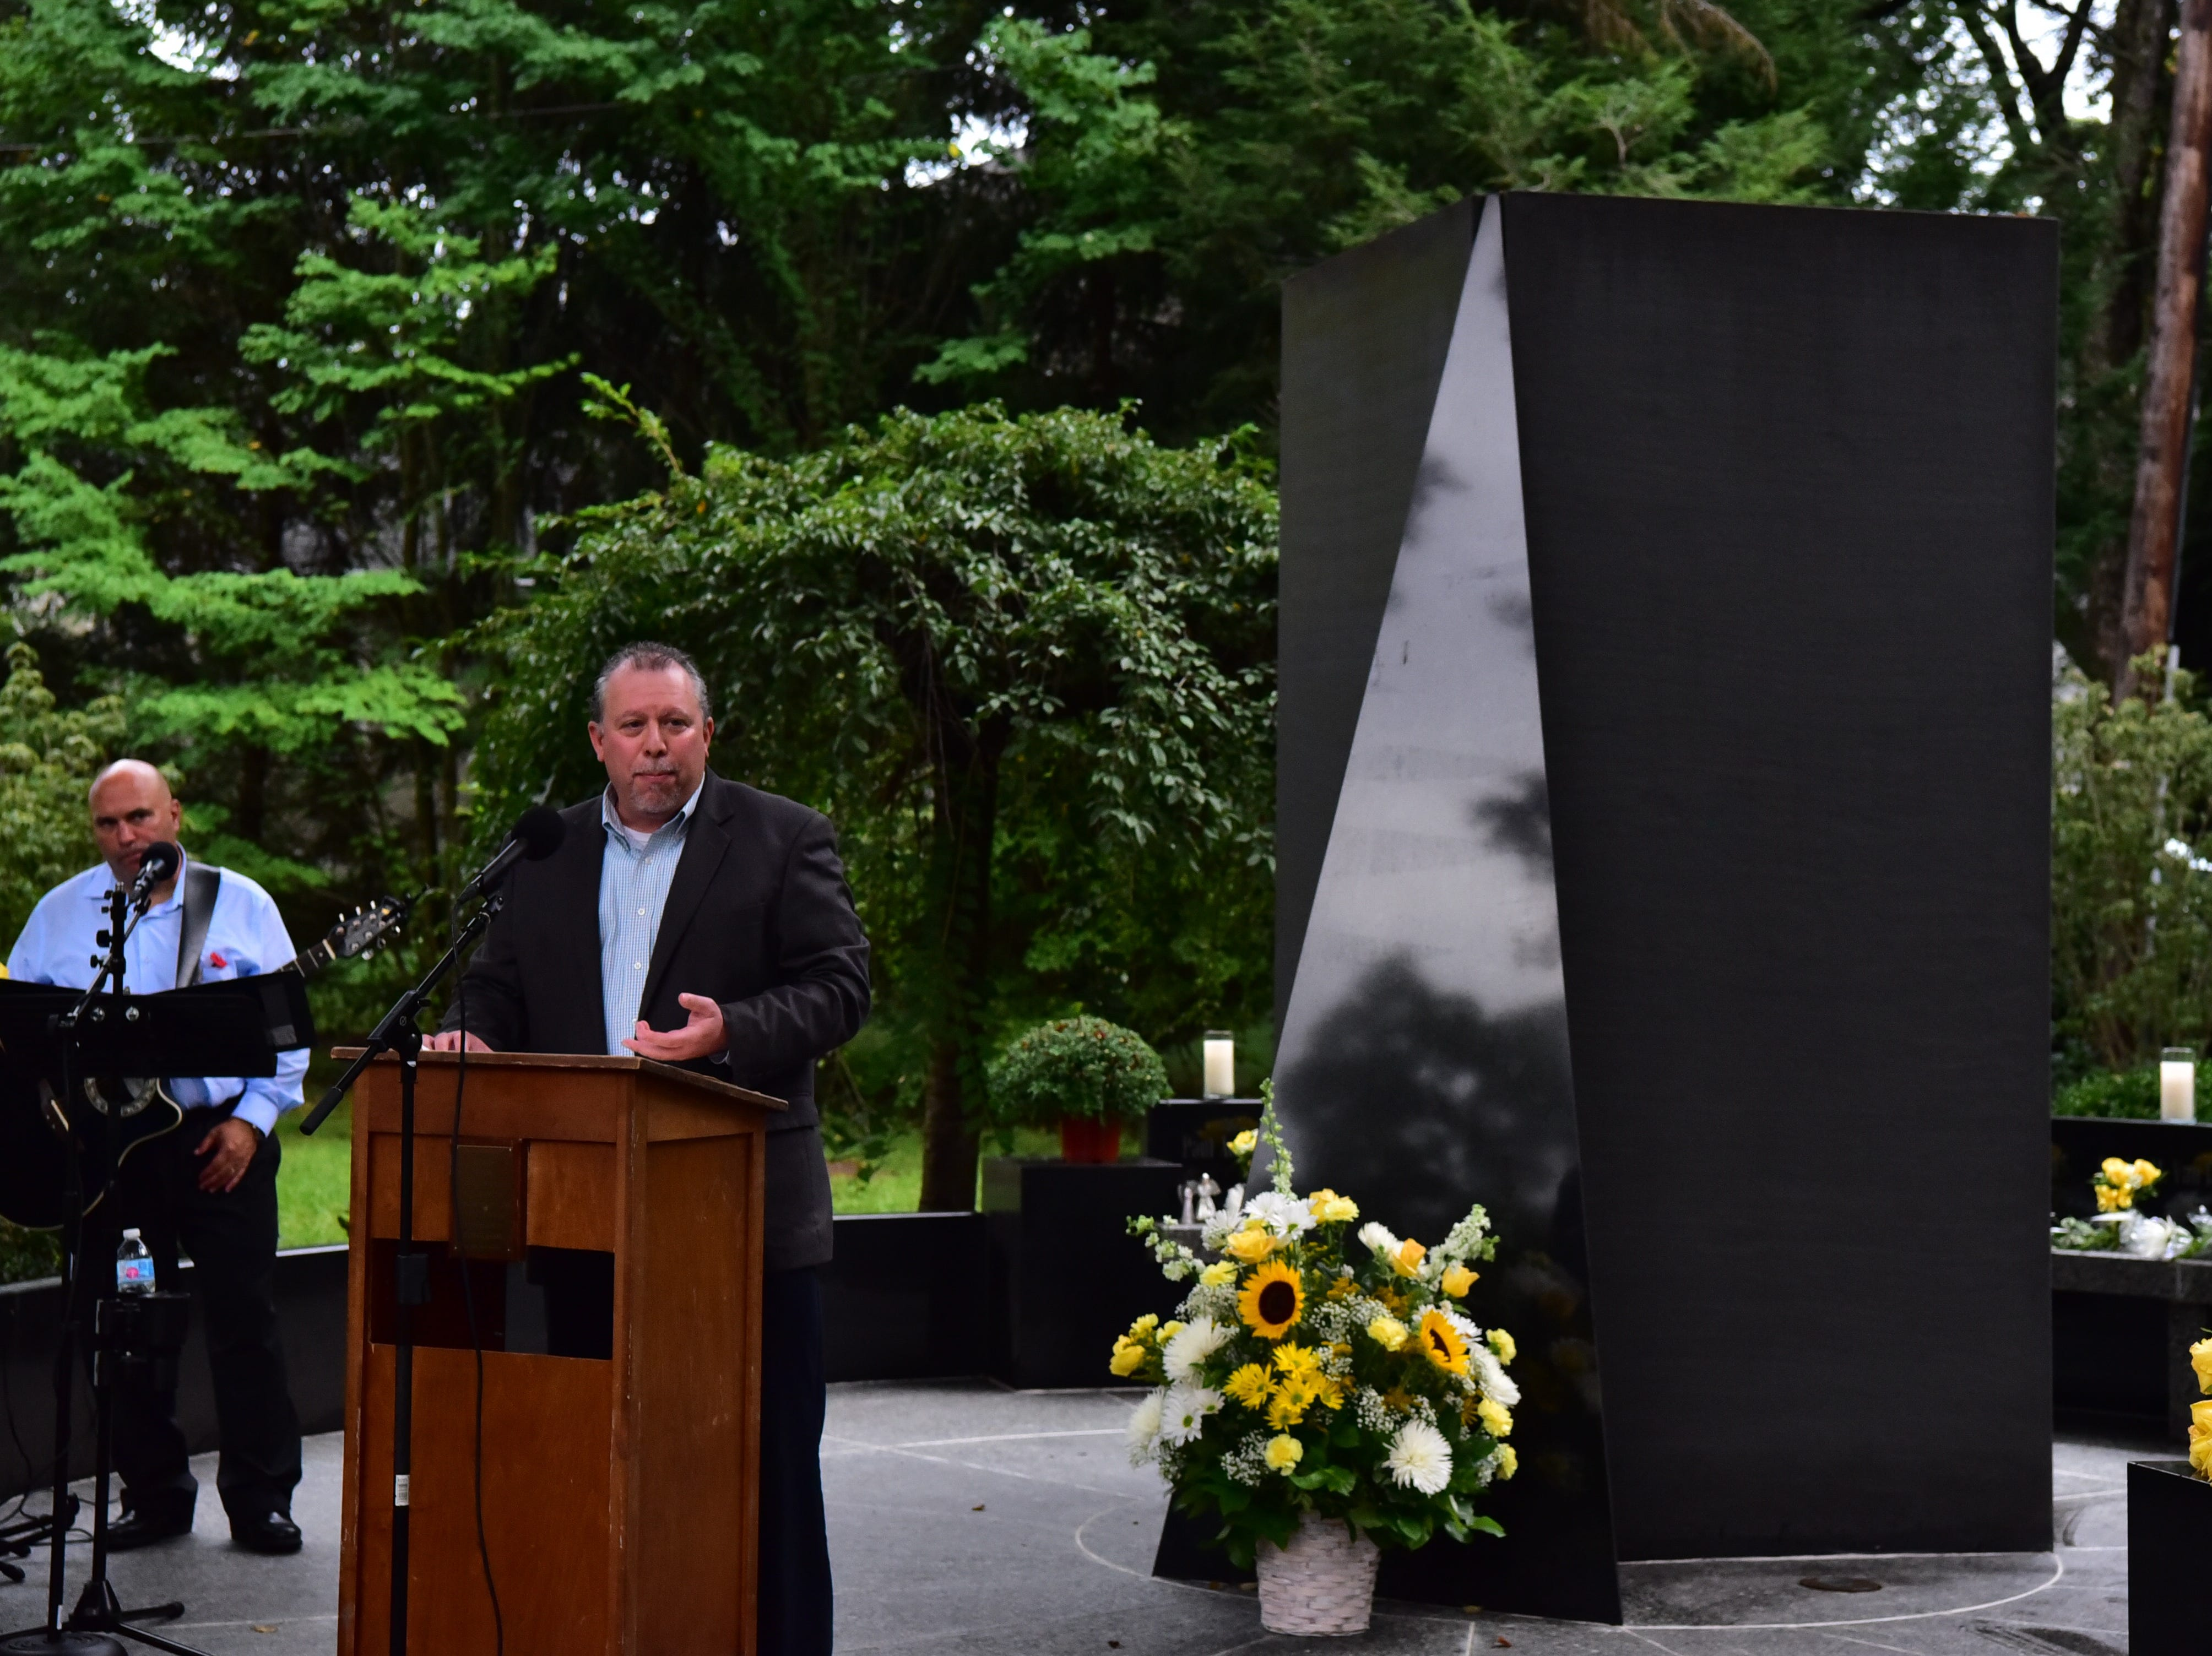 Glen Rock Mayor Bruce Packer delivers a speech at 9-11 memorial in Glen Rock, NJ.